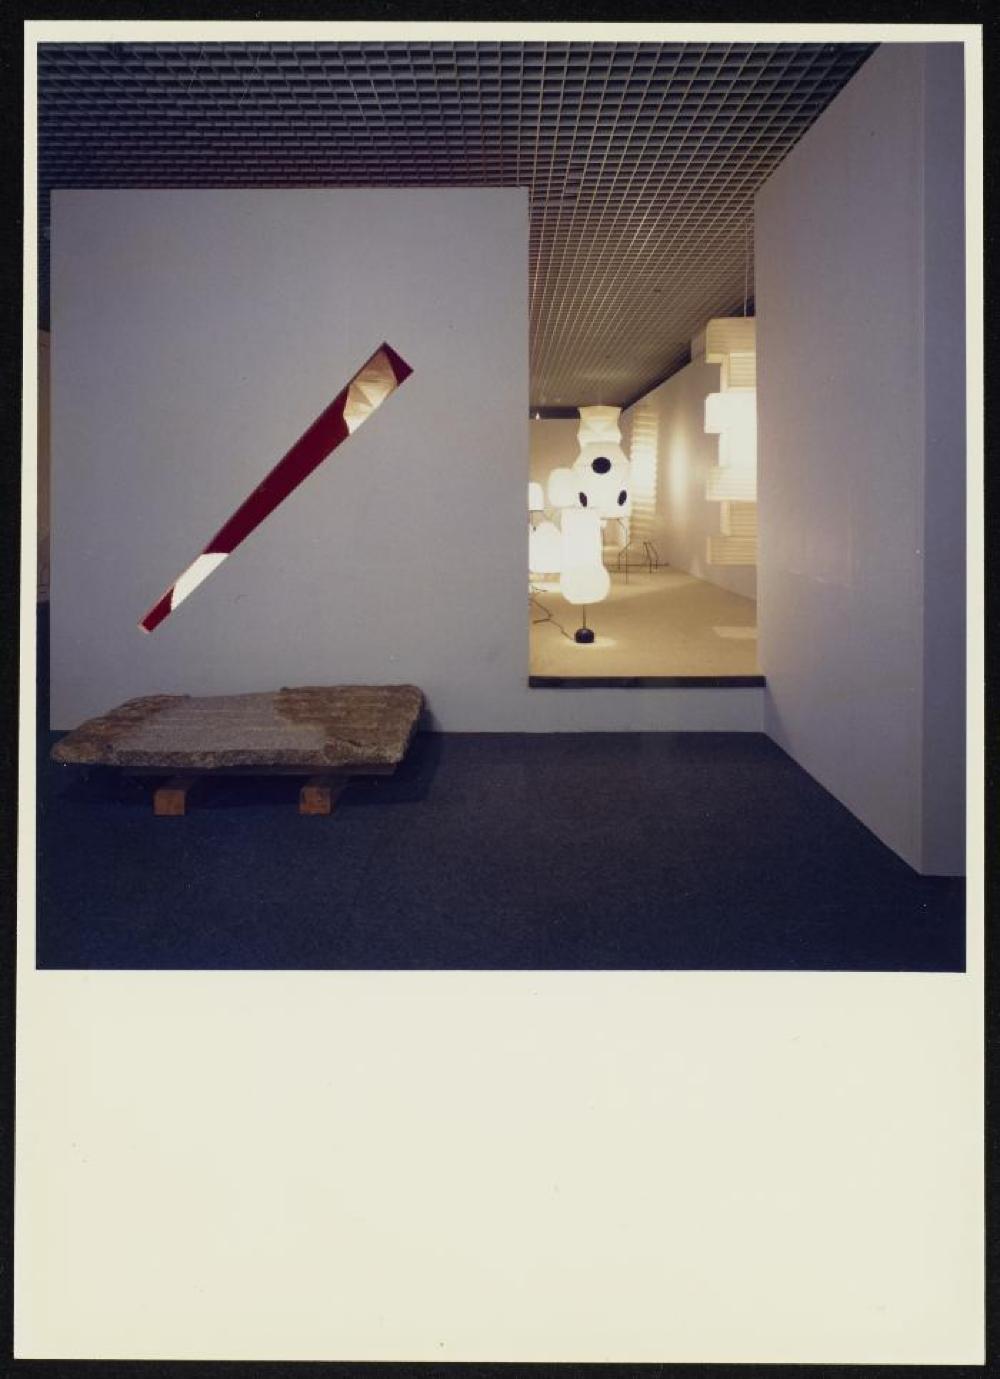 Seibu Museum/Yurakucho Art Forum exhibit images